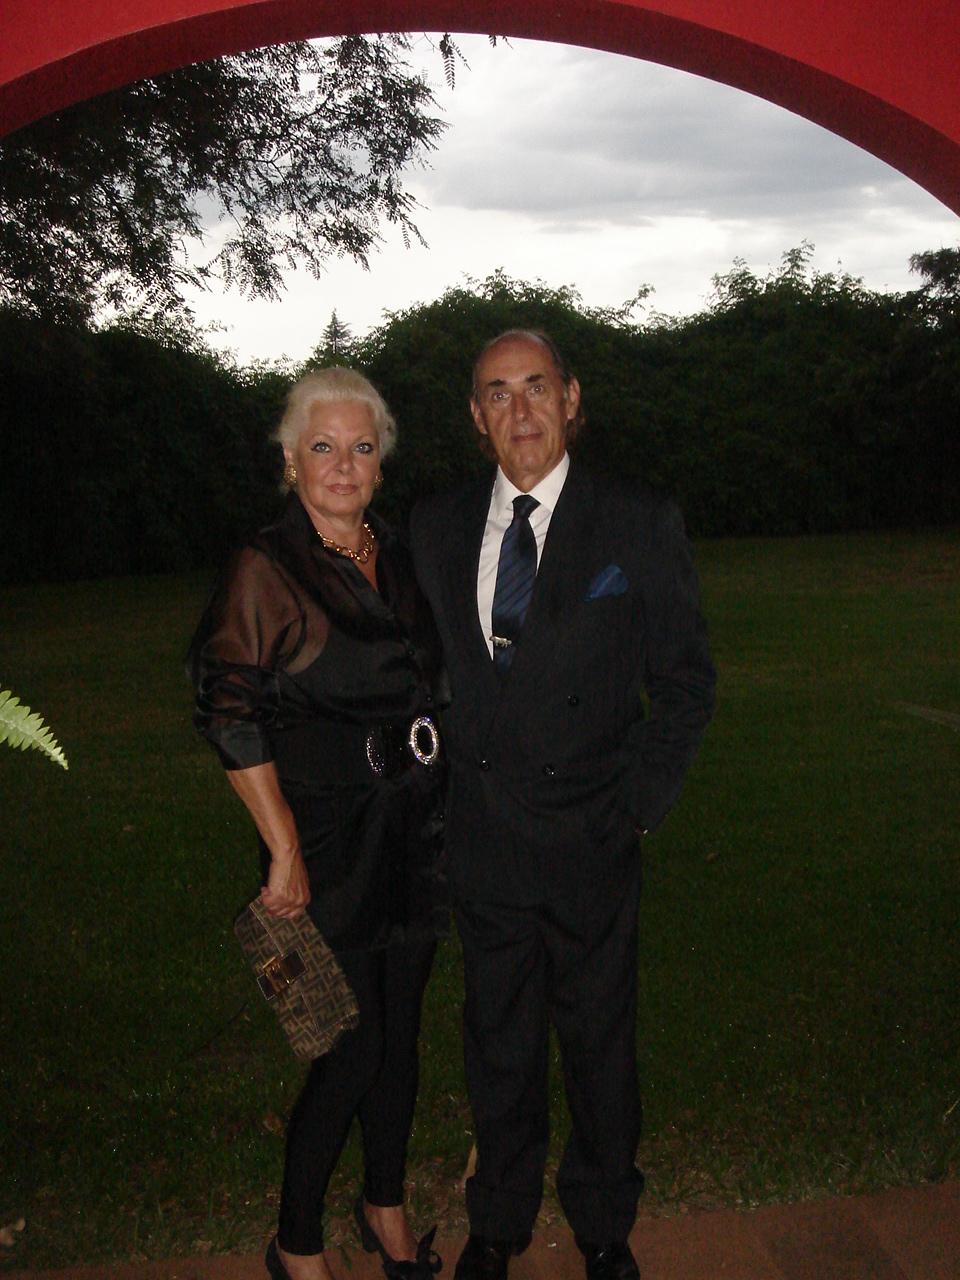 Liana e Saulo, pais do noivo